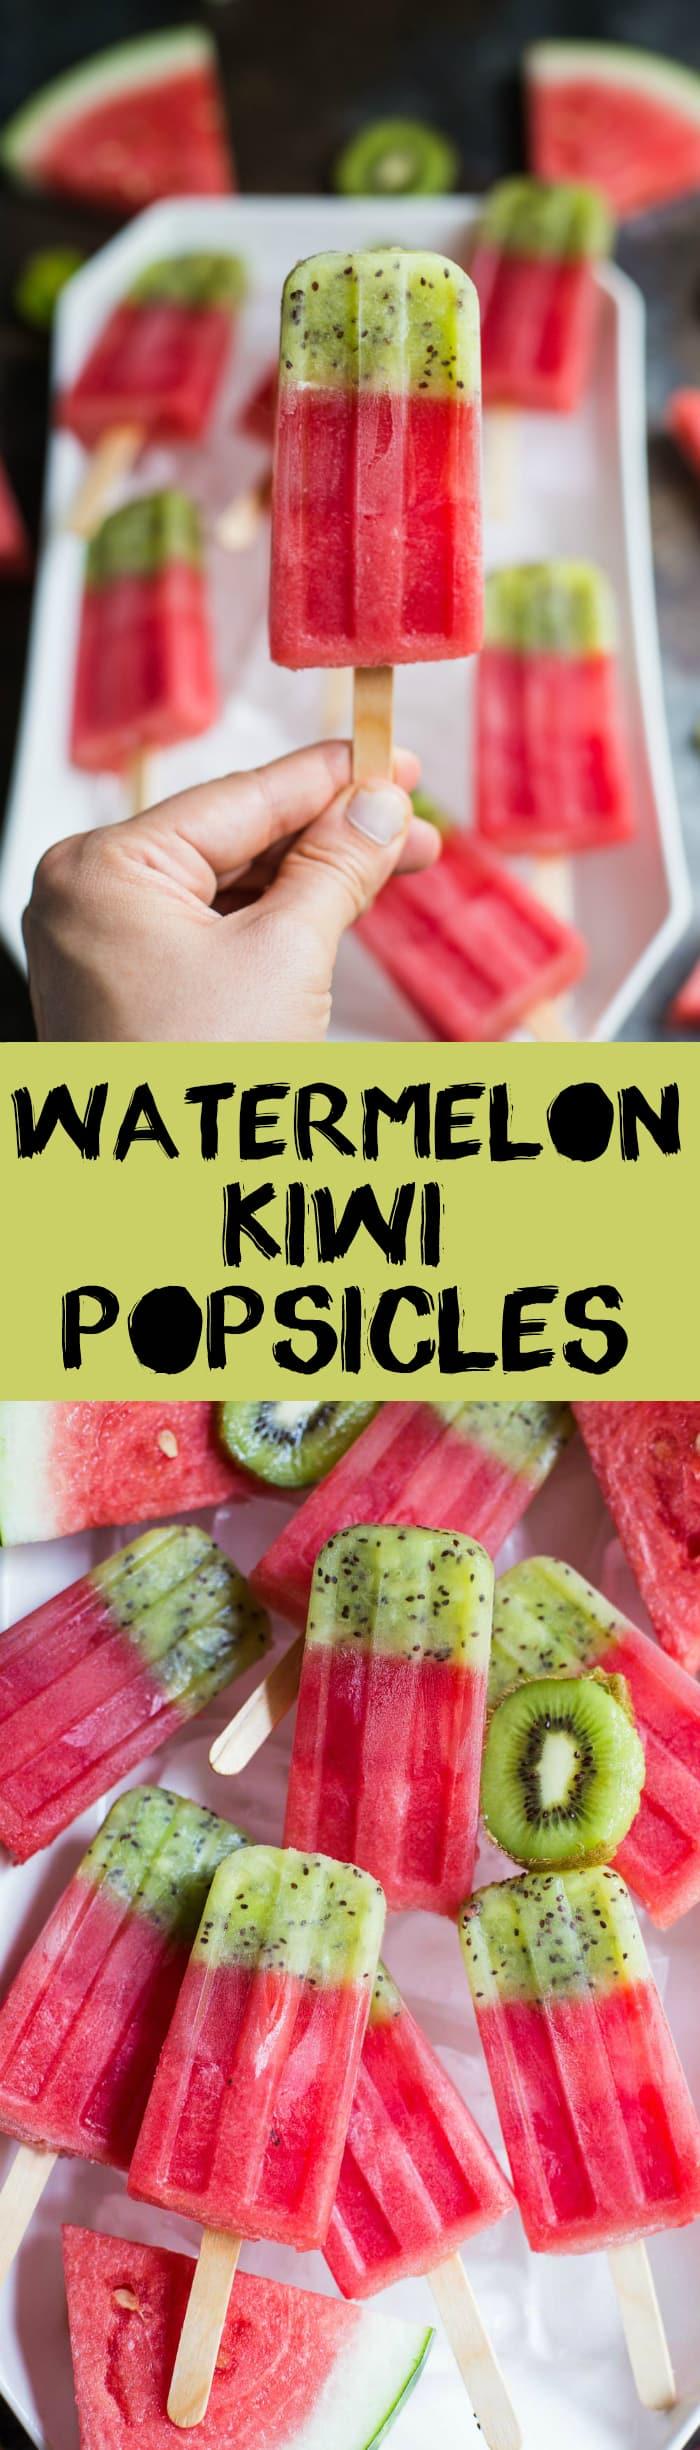 watermelon kiwi popsicles pinterest